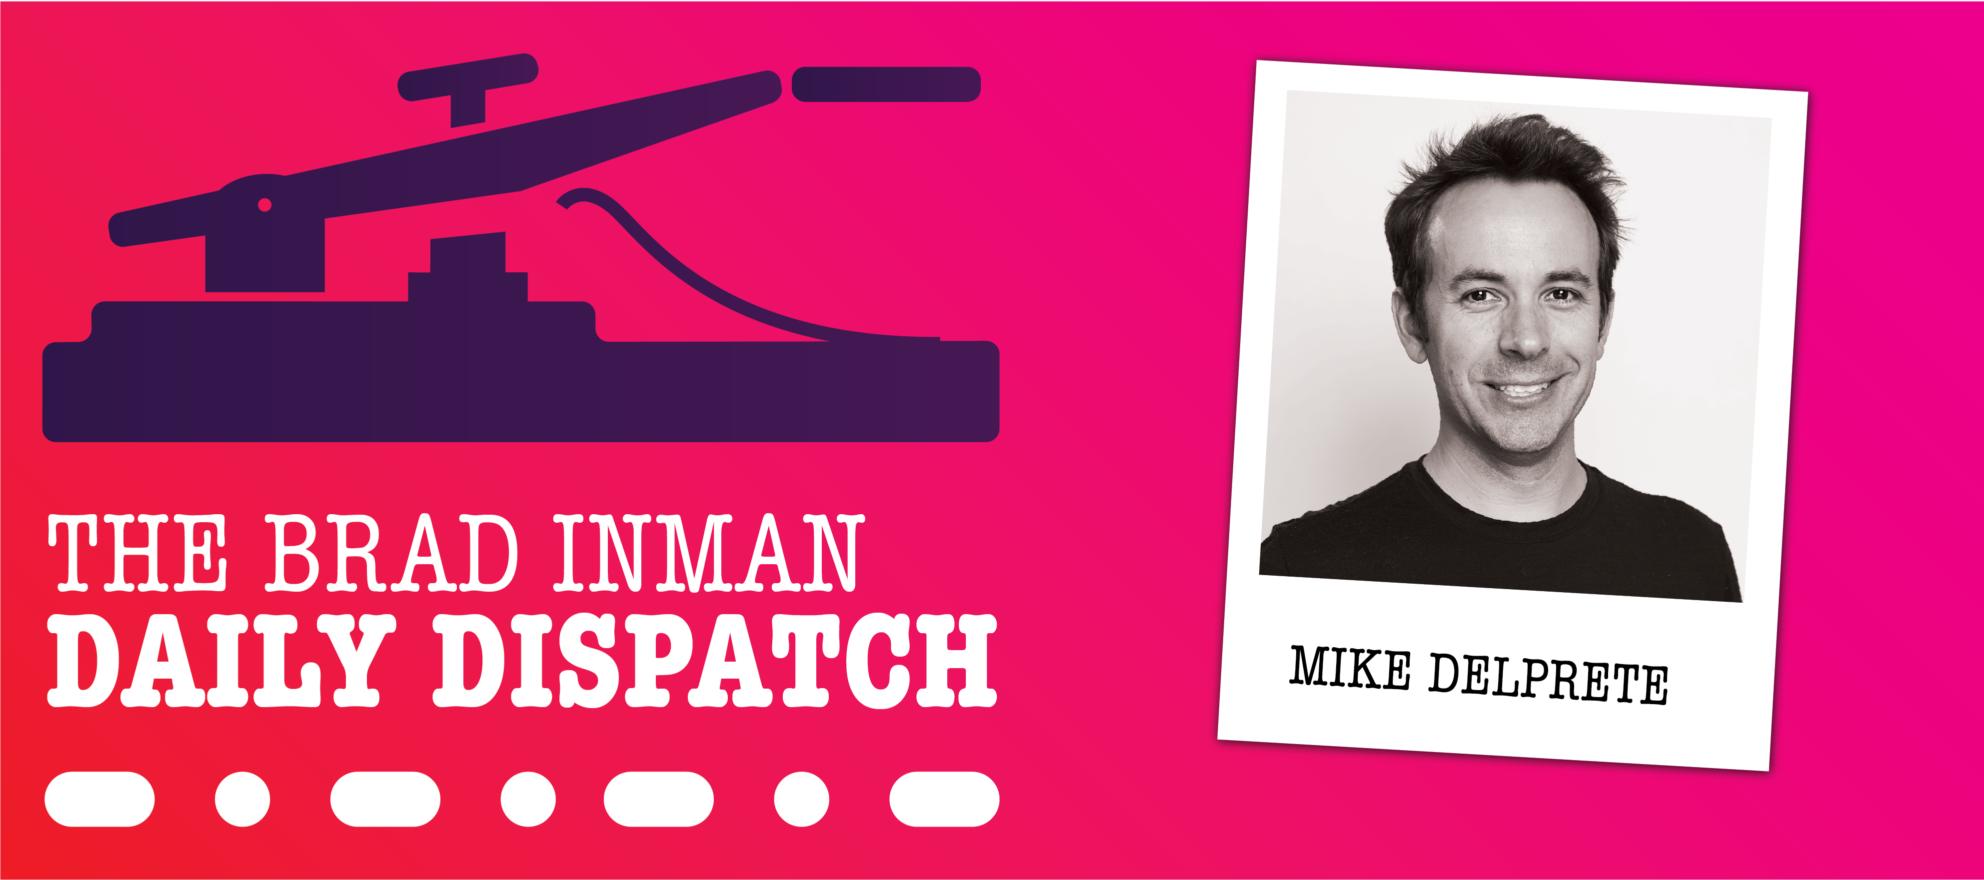 Daily Dispatch: Brad Inman and Mike DelPrete